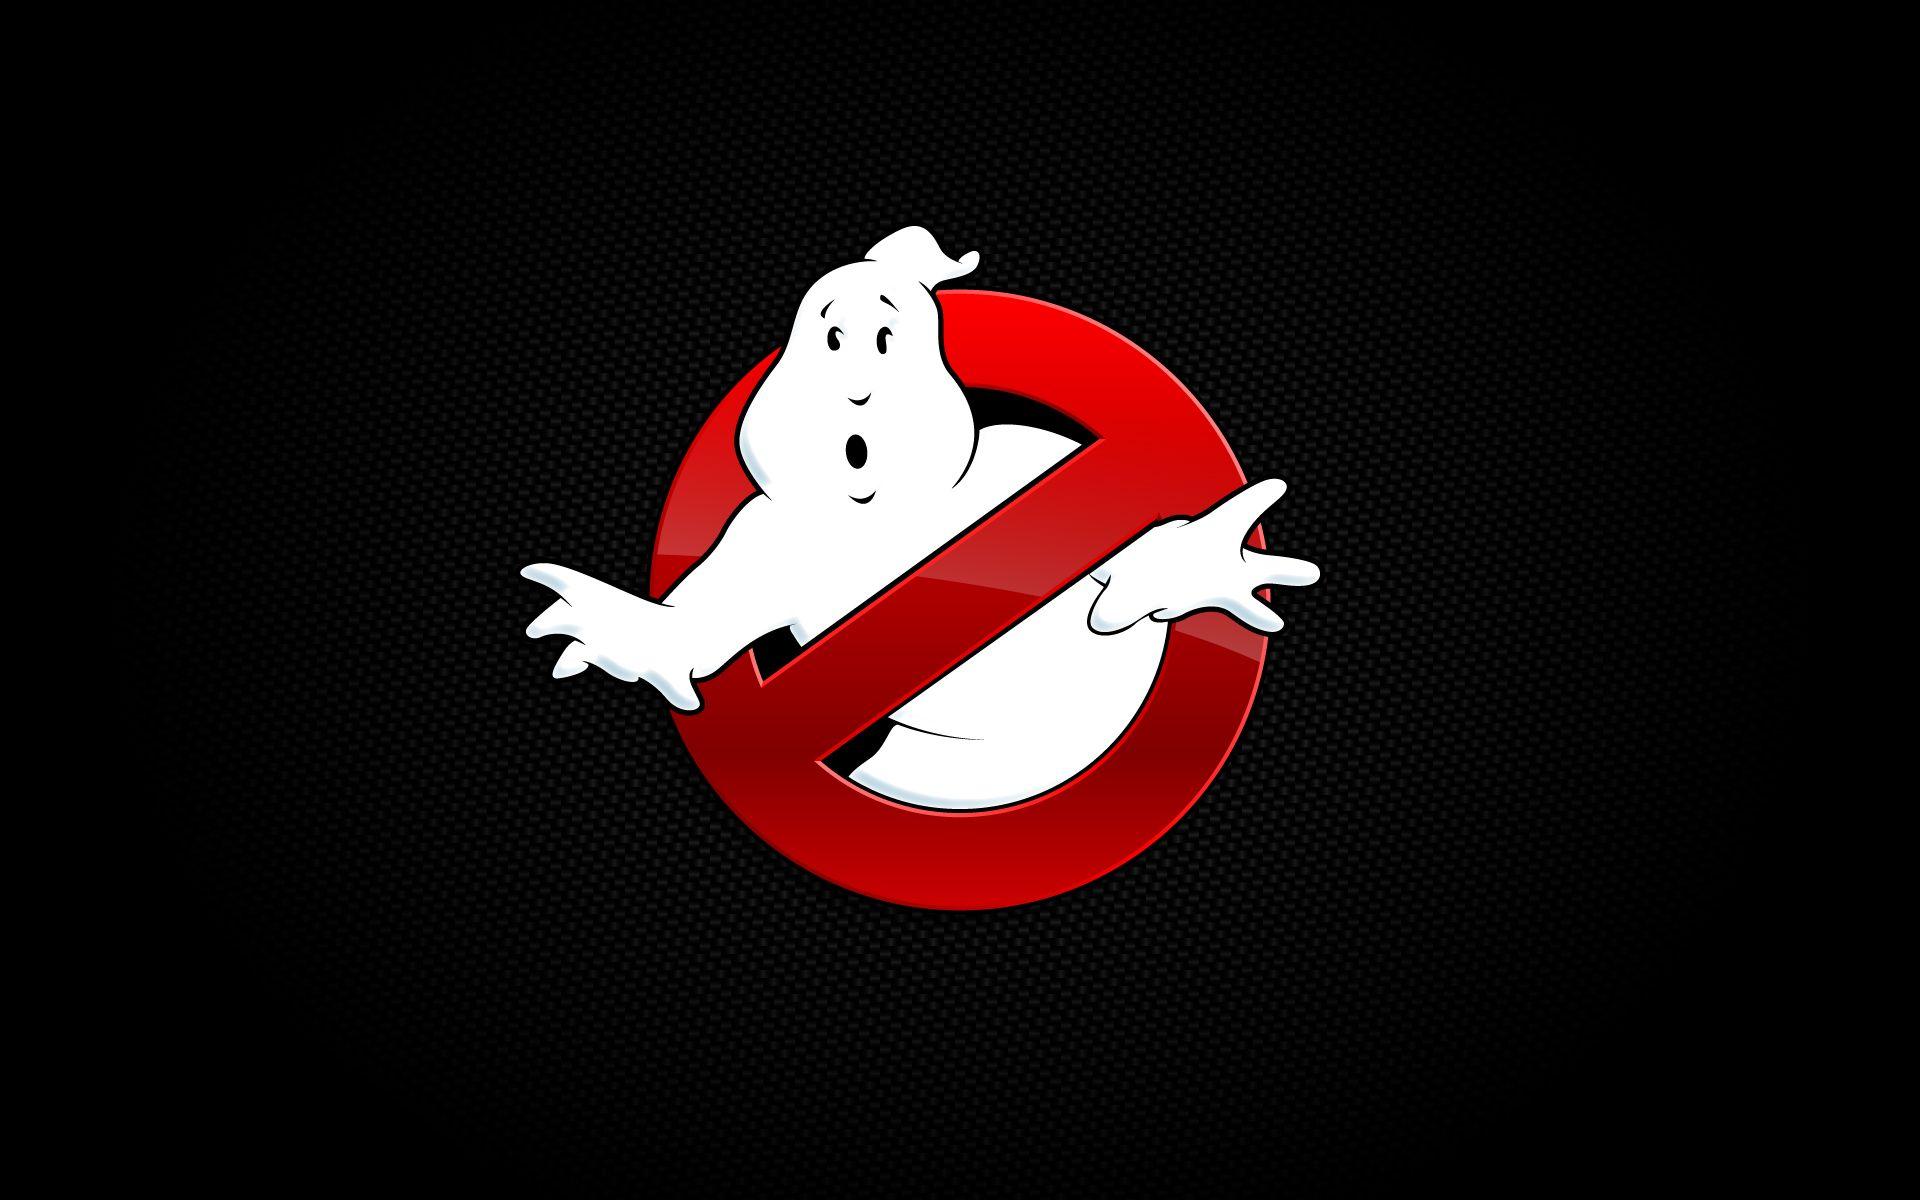 #Ghostbusters #Wallpaper- by SpazChicken